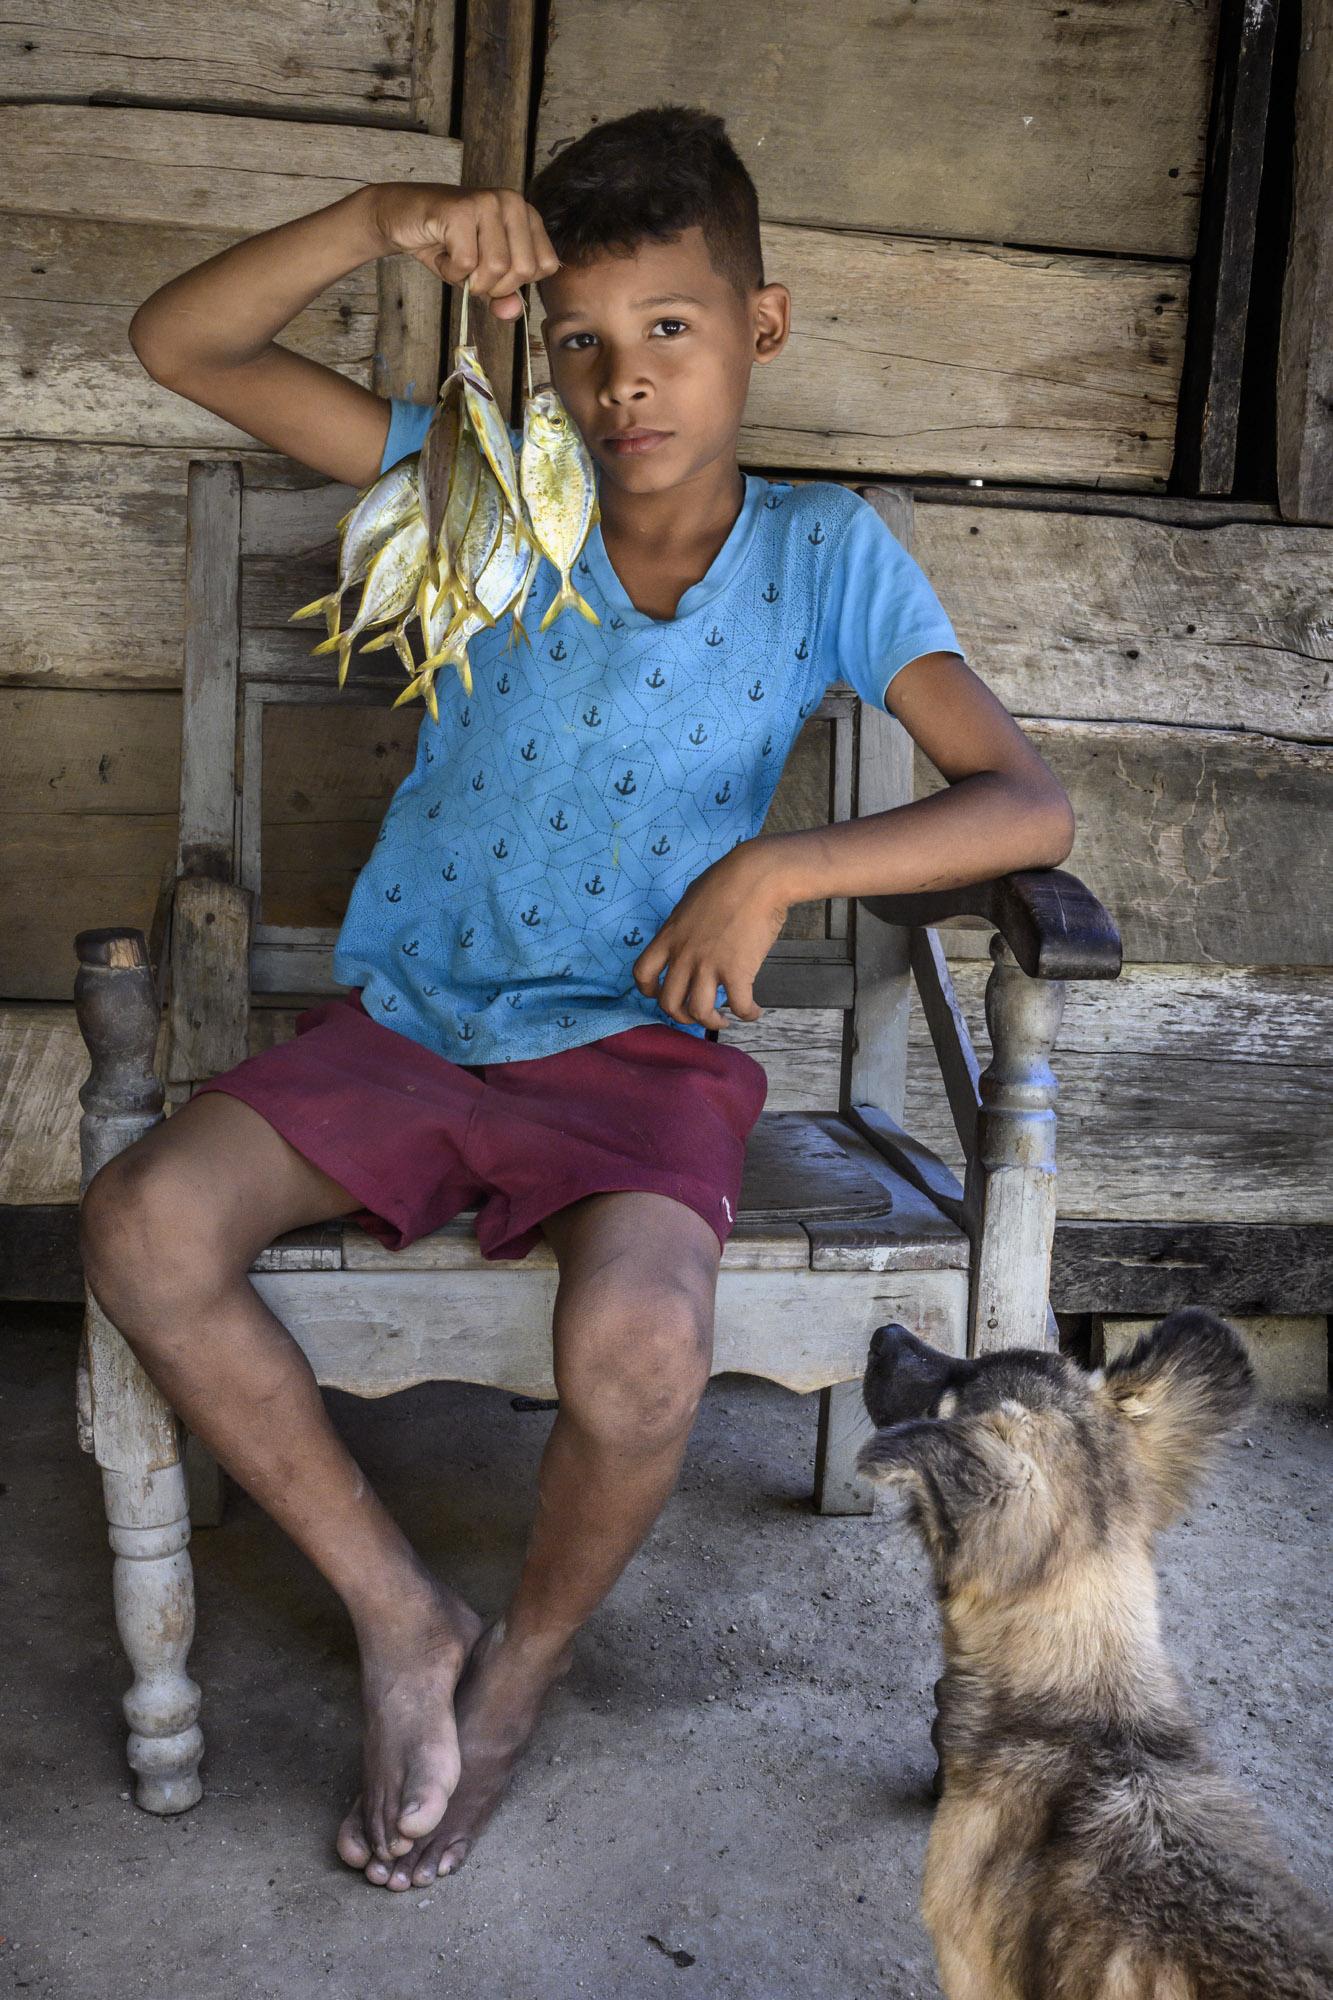 Sierra Maestra - Cuba - Hector Garrido, Aerial and human photography